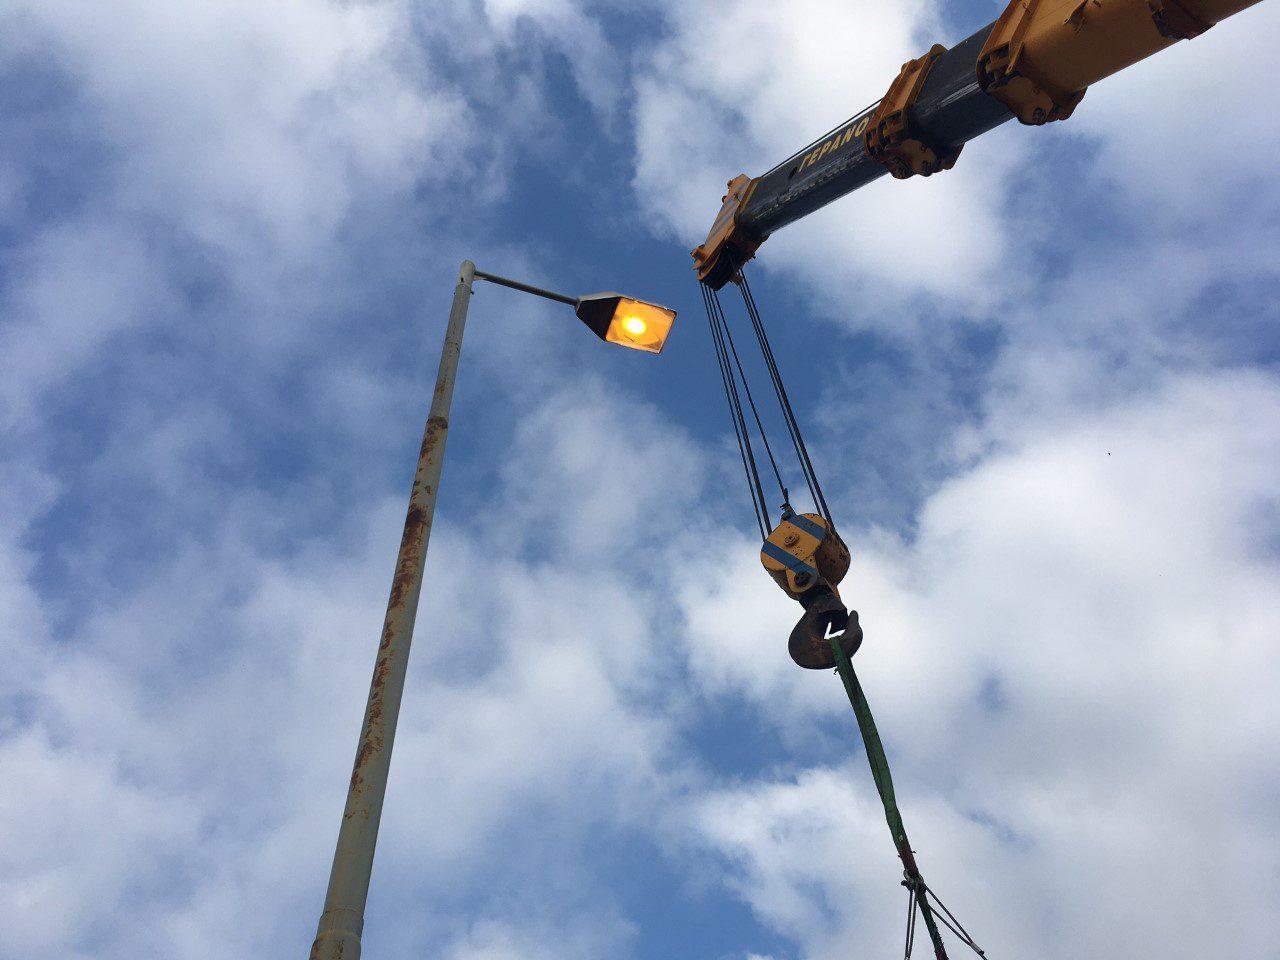 "You are currently viewing Σε εξέλιξη το έργο αλλαγής ηλεκτροφωτισμού στη ΧΖΛ Ελευσίνας – Περατώθηκαν εργασίες για την επάρκεια φωτισμού στην περιοχή ""Κρόνος"""